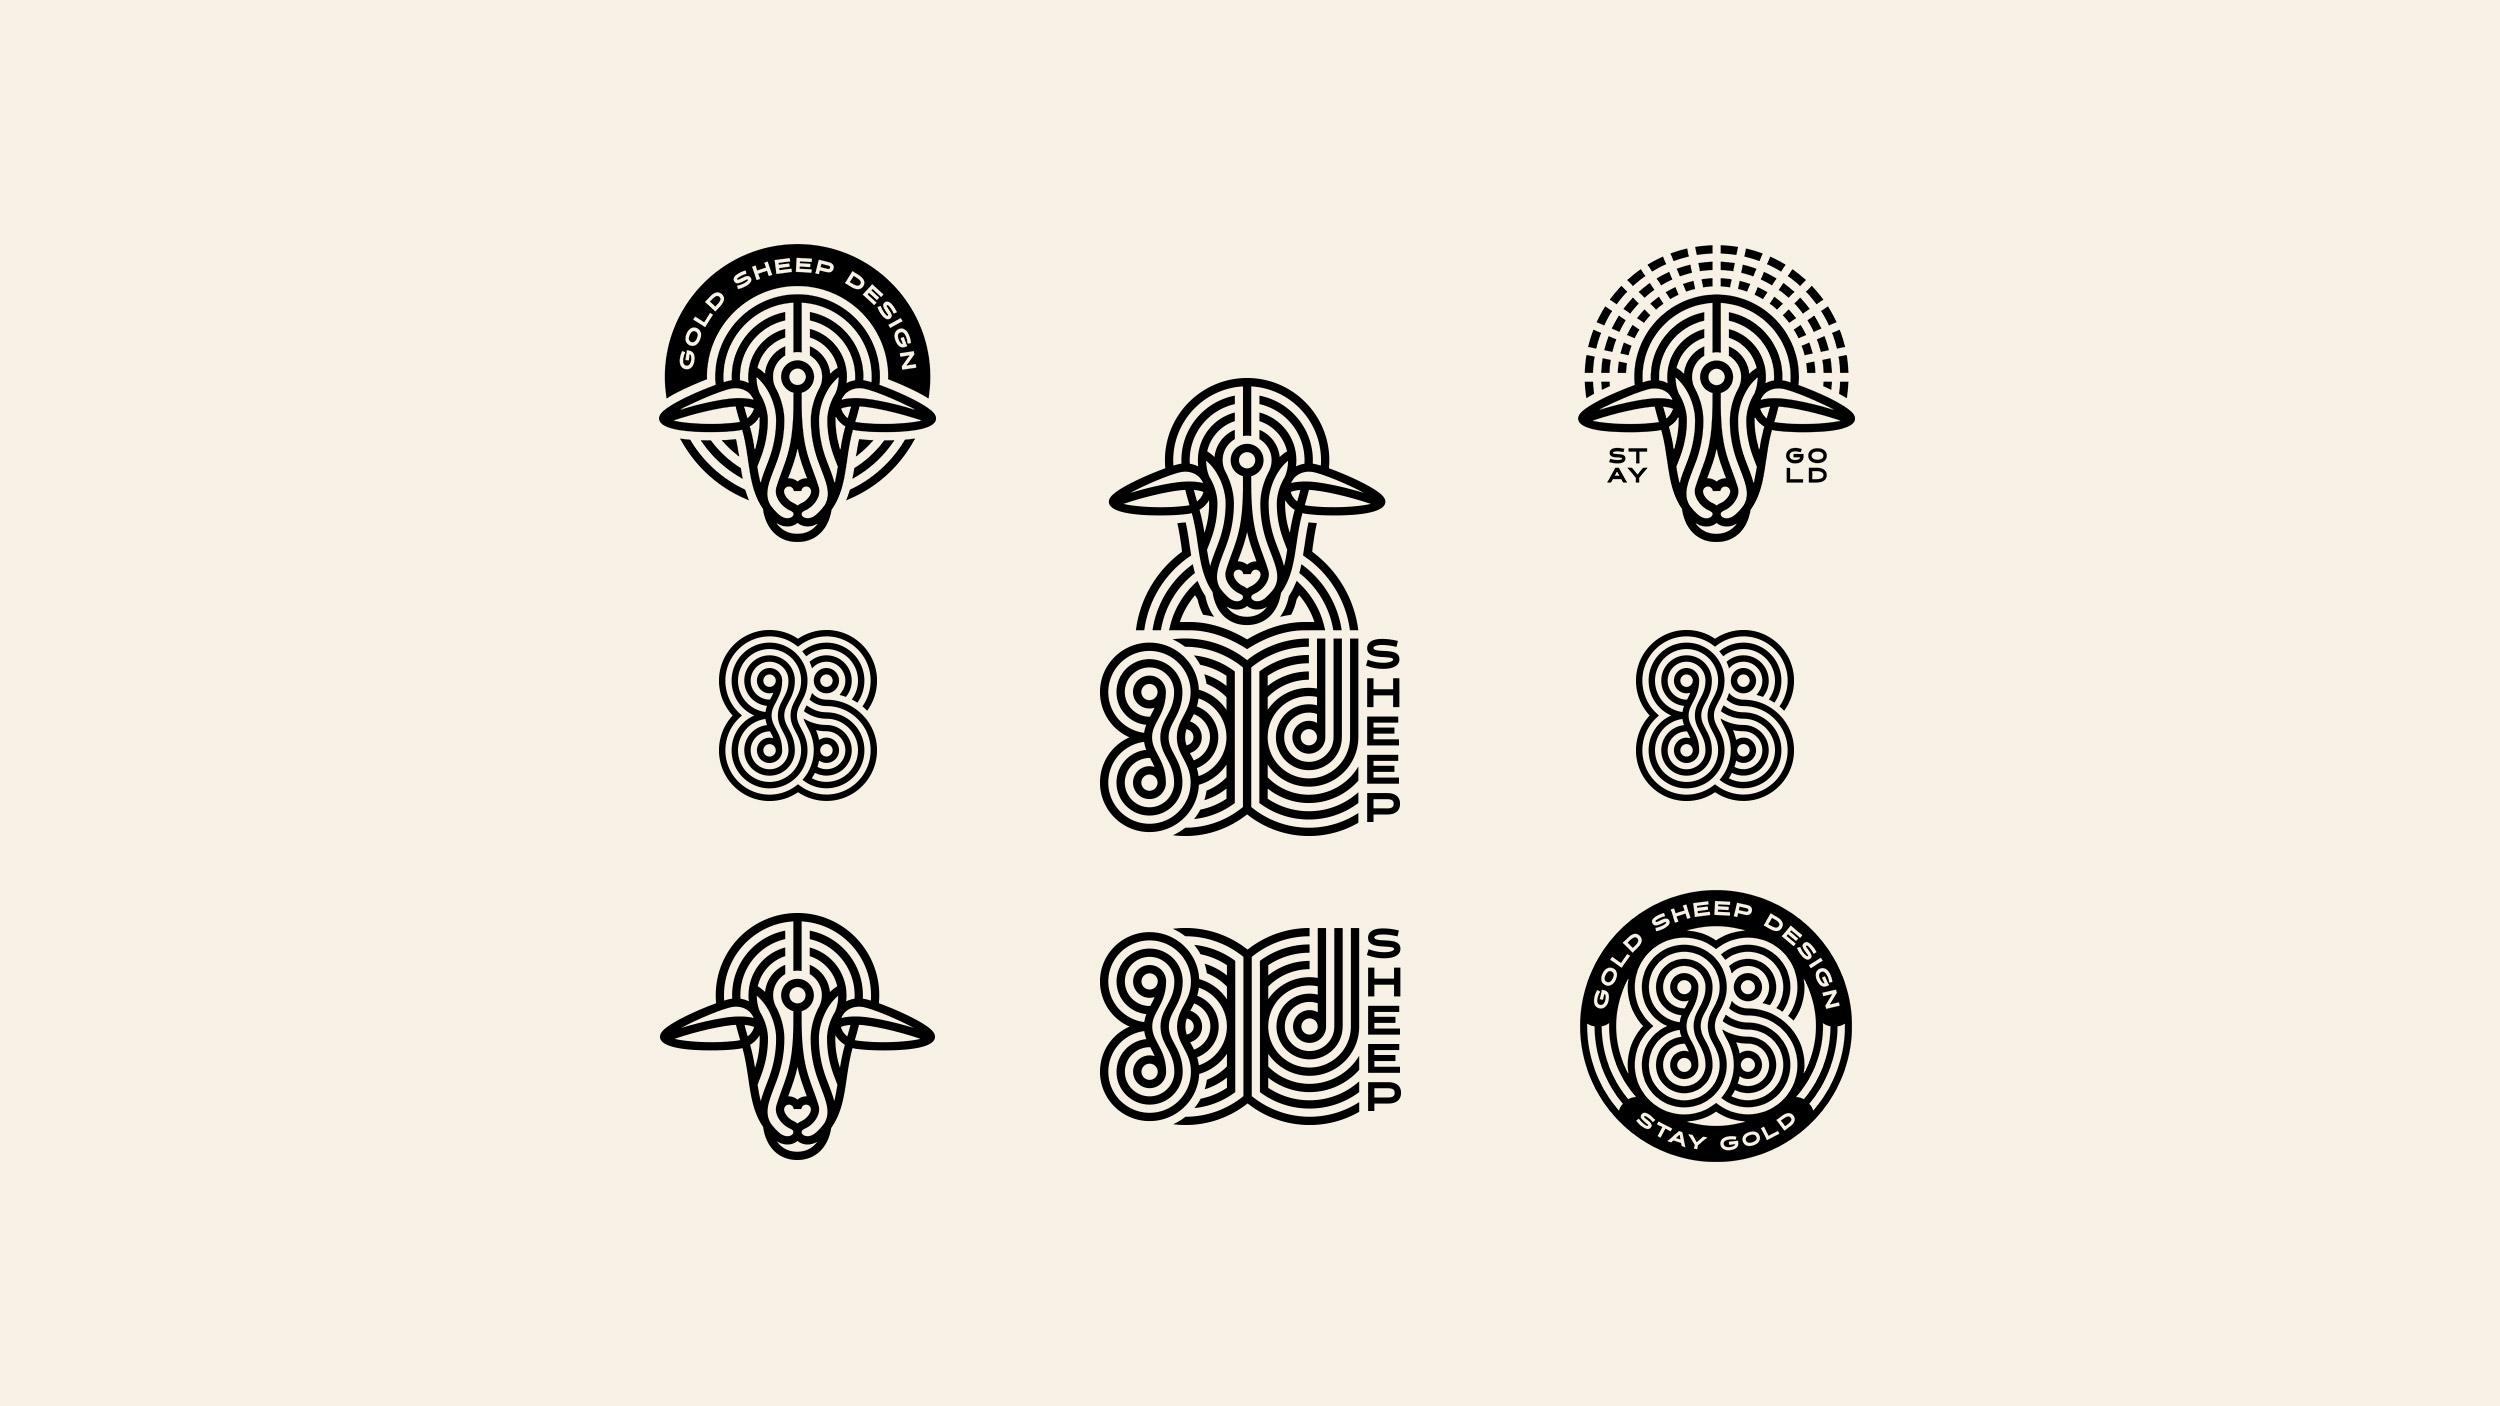 Gold Sheep Design Brand Logo System